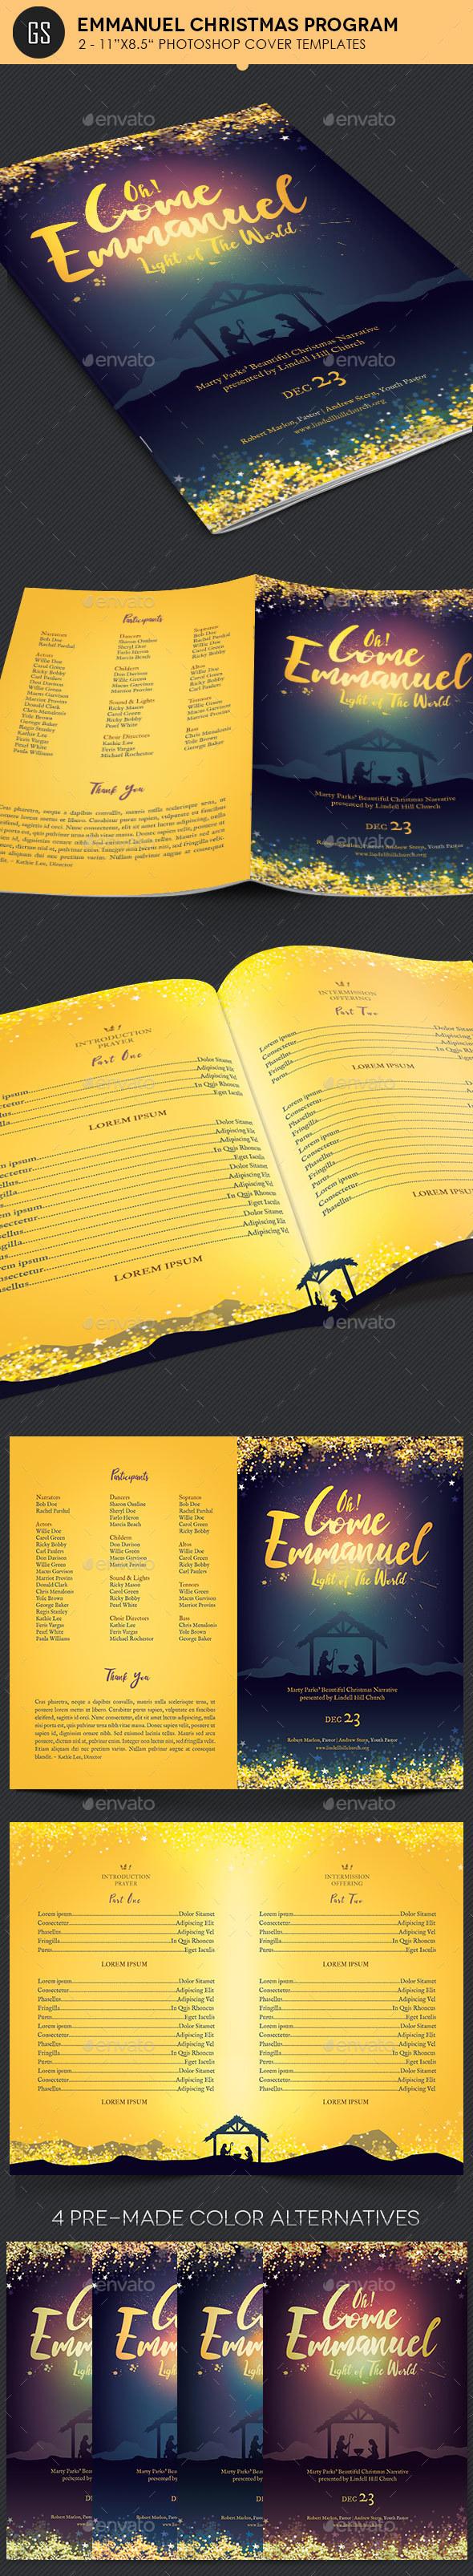 Emmanuel Christmas Cantata Program Template - Informational Brochures